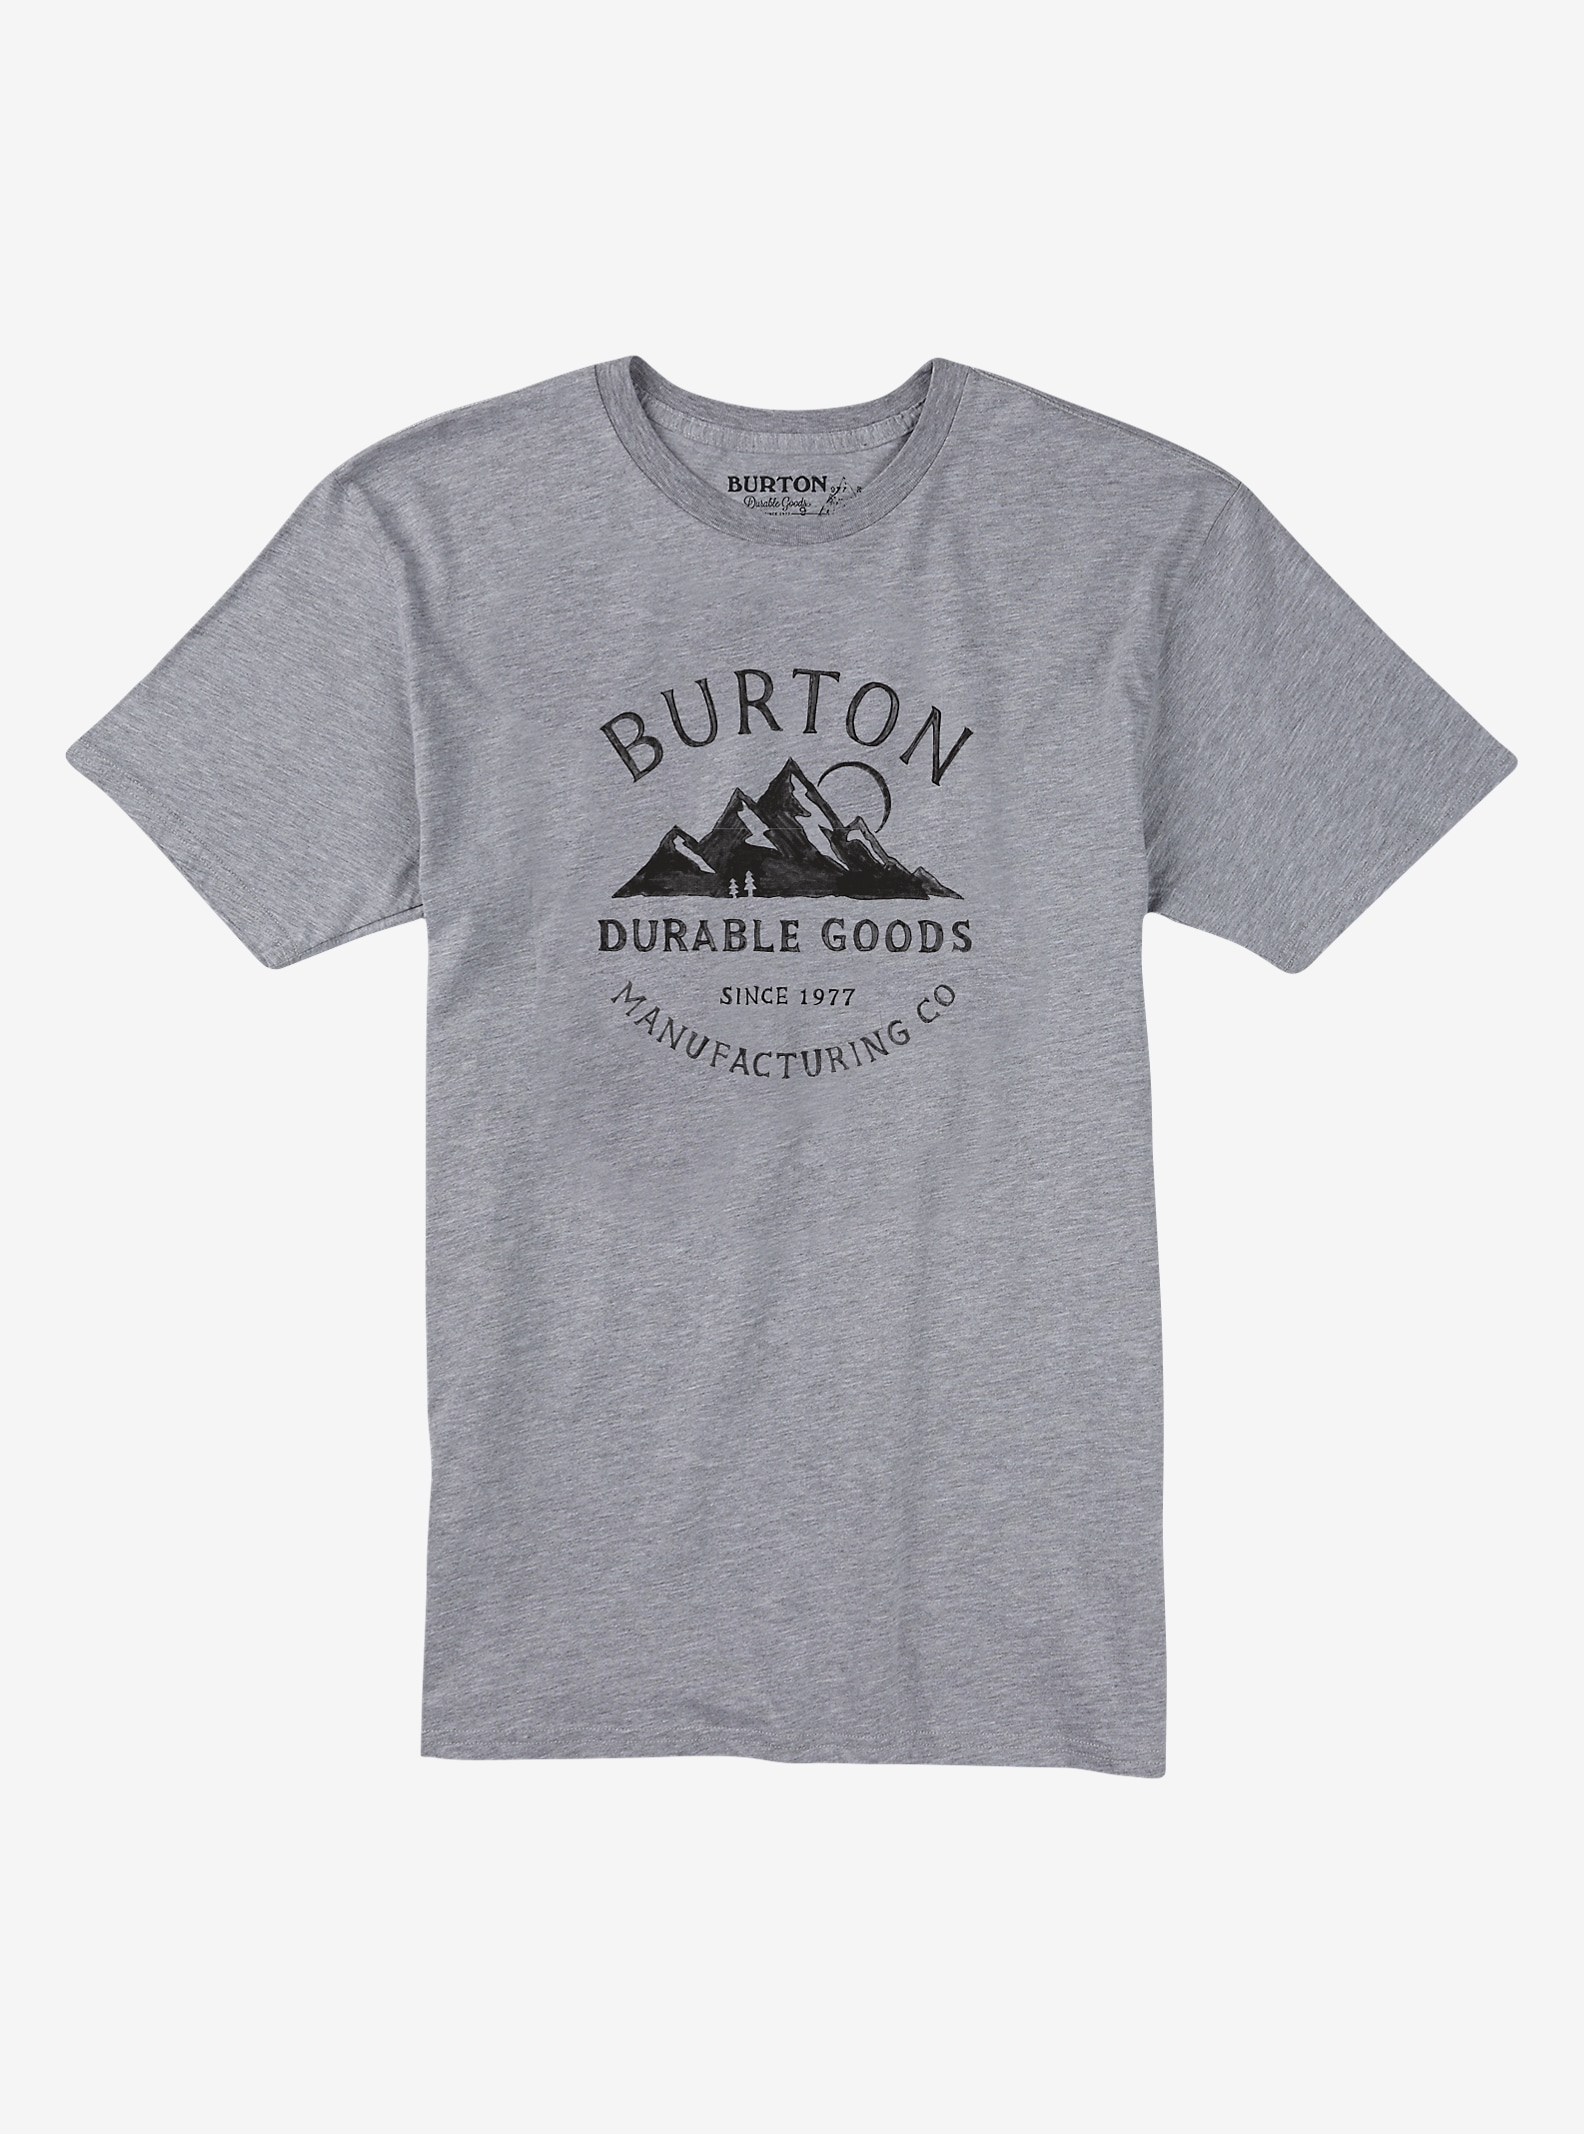 Burton Overlook T-Shirt angezeigt in Gray Heather